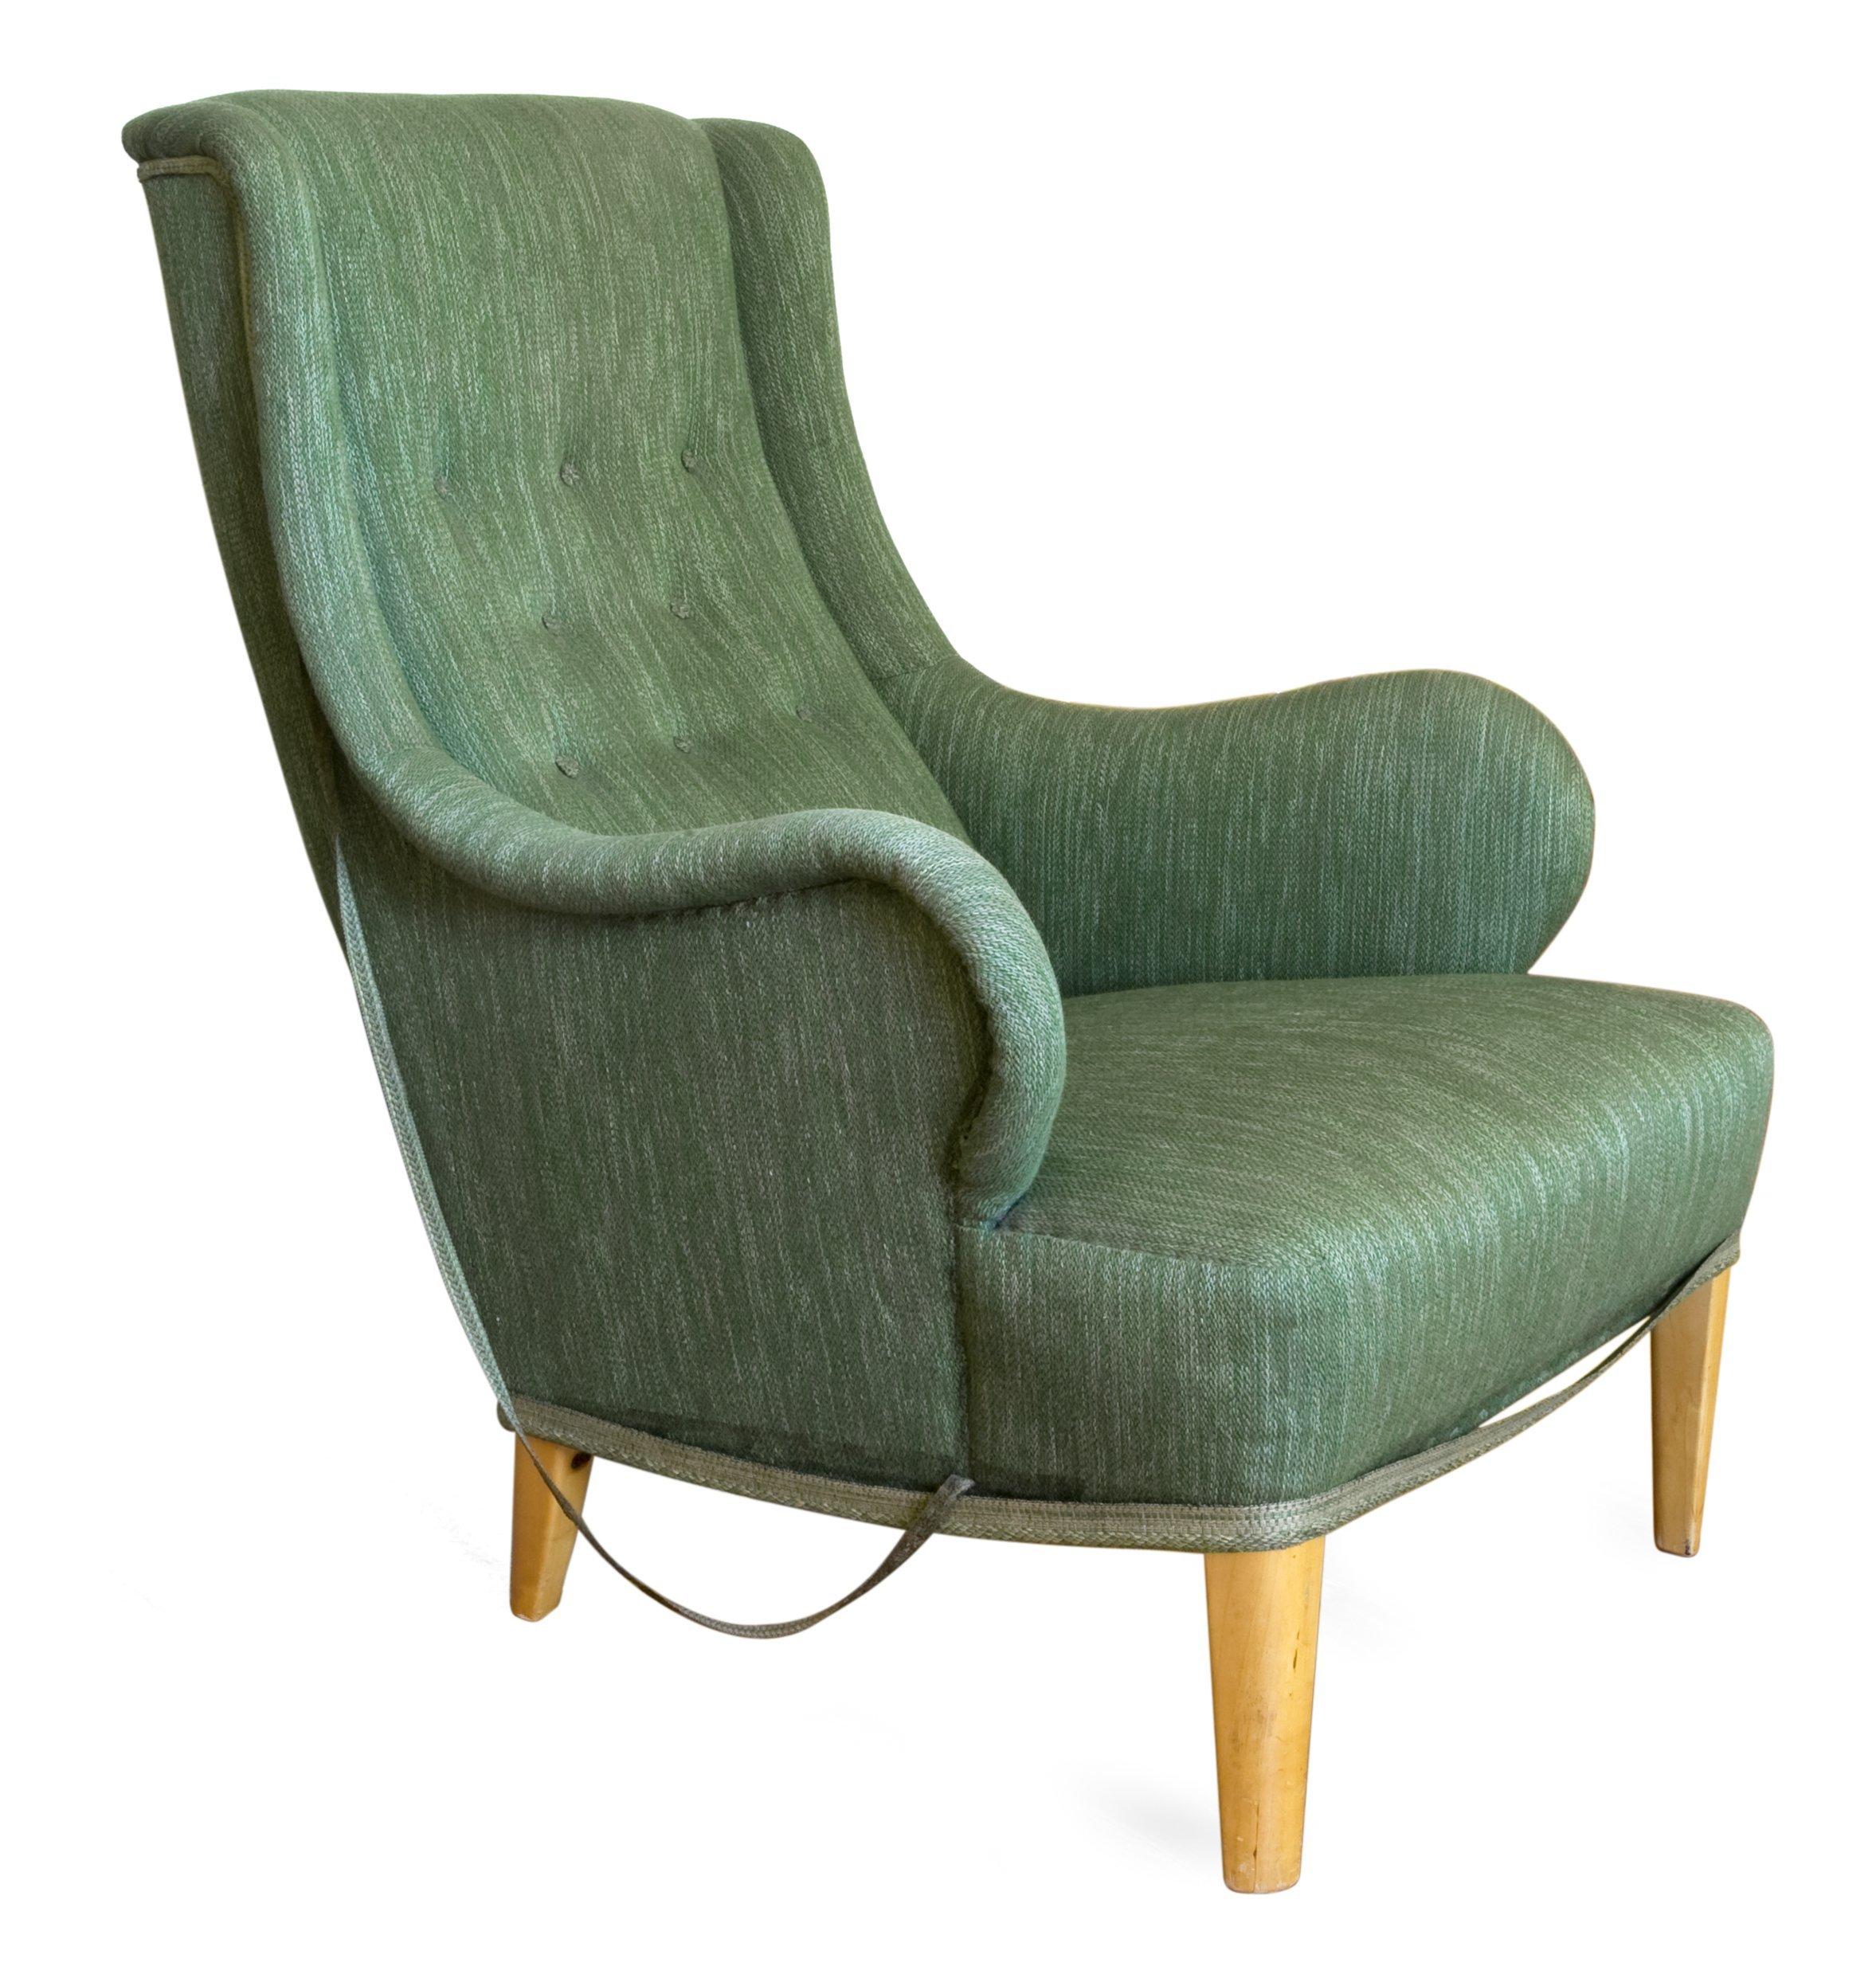 "FåTÖLJ,""Oscar"", Carl Malmsten Modellen formgiven 1935 Grön klädsel Bukowskis"